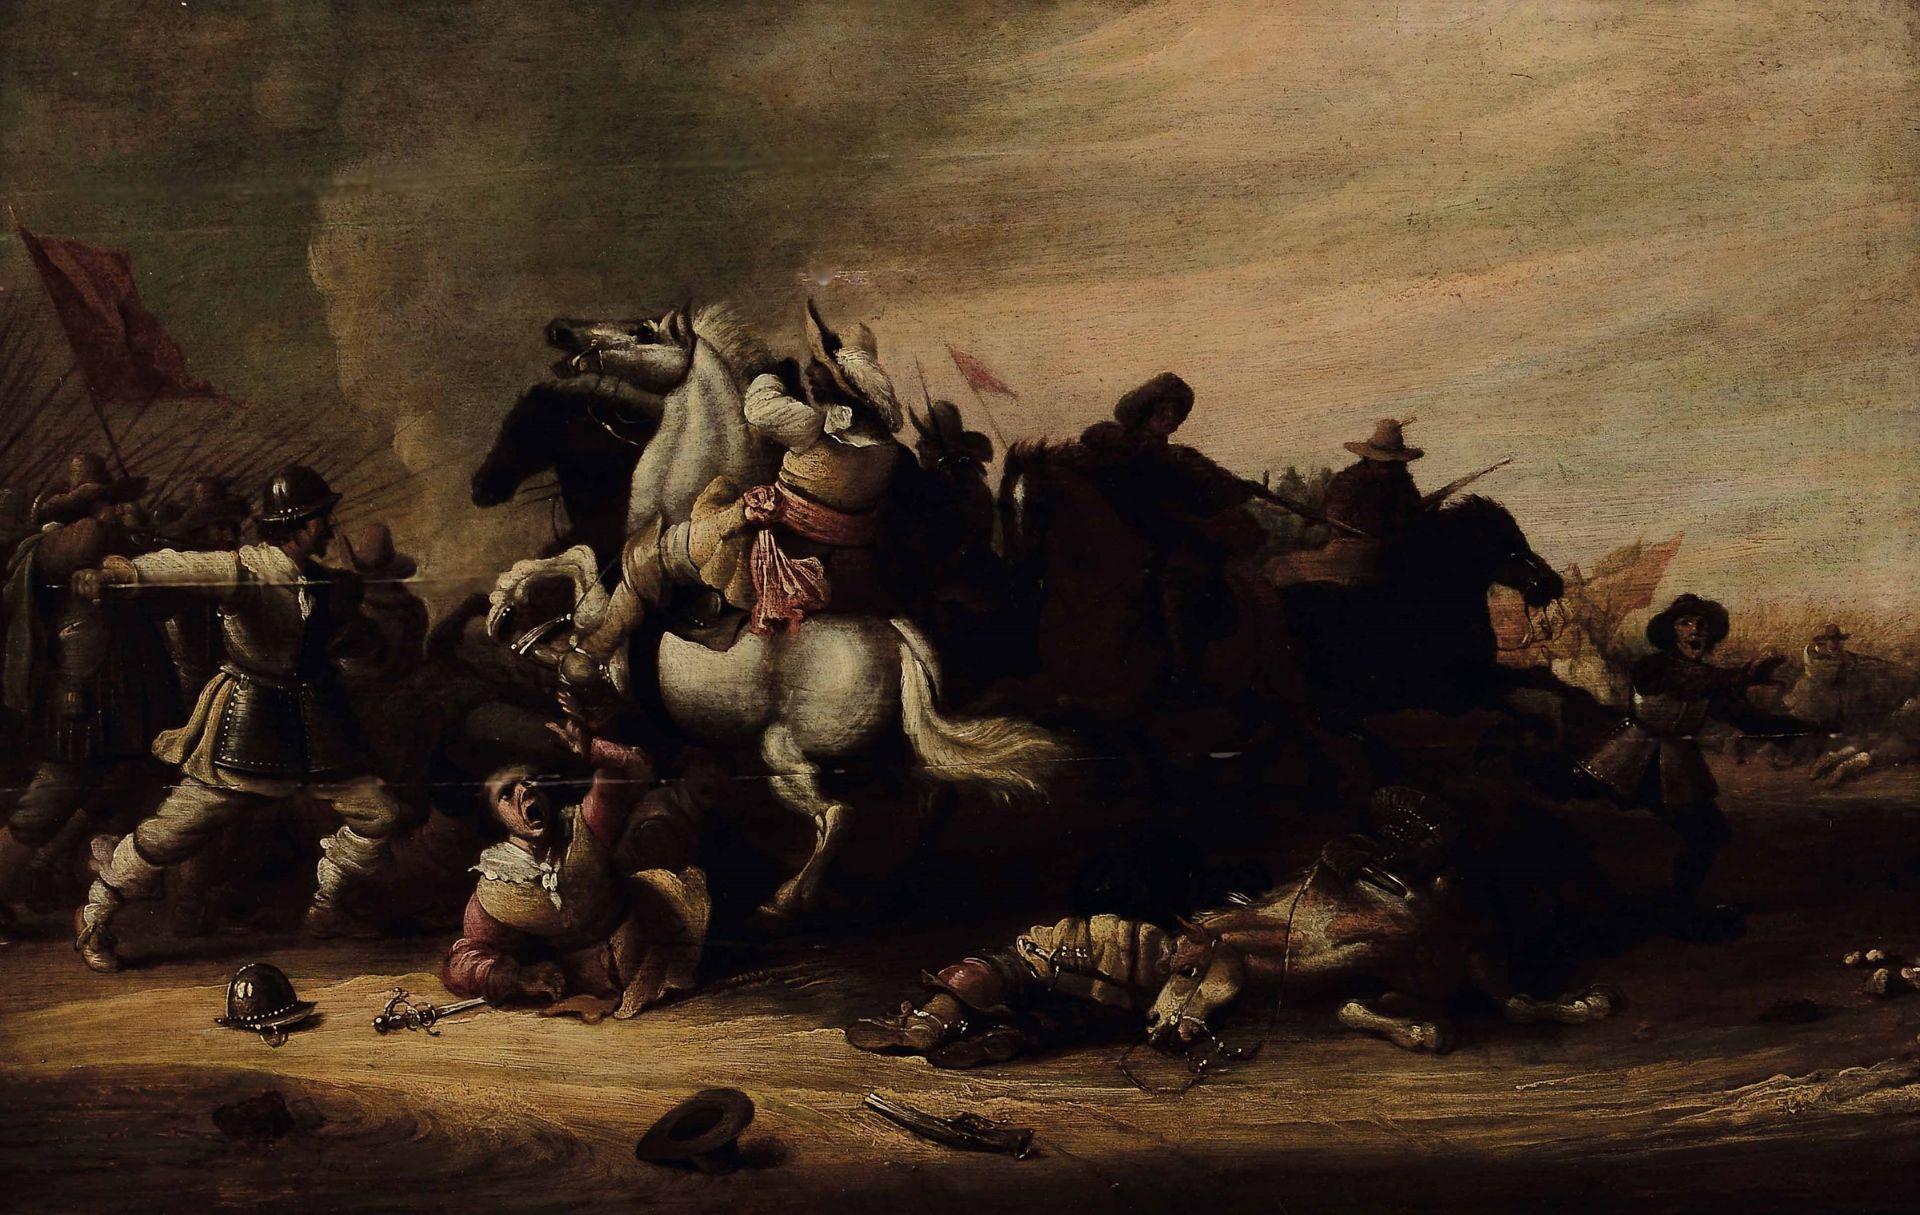 Los 58 - Esaias van de Velde (Amsterdam 1587 - L'Aia 1630), Scena di battaglia - olio su [...]